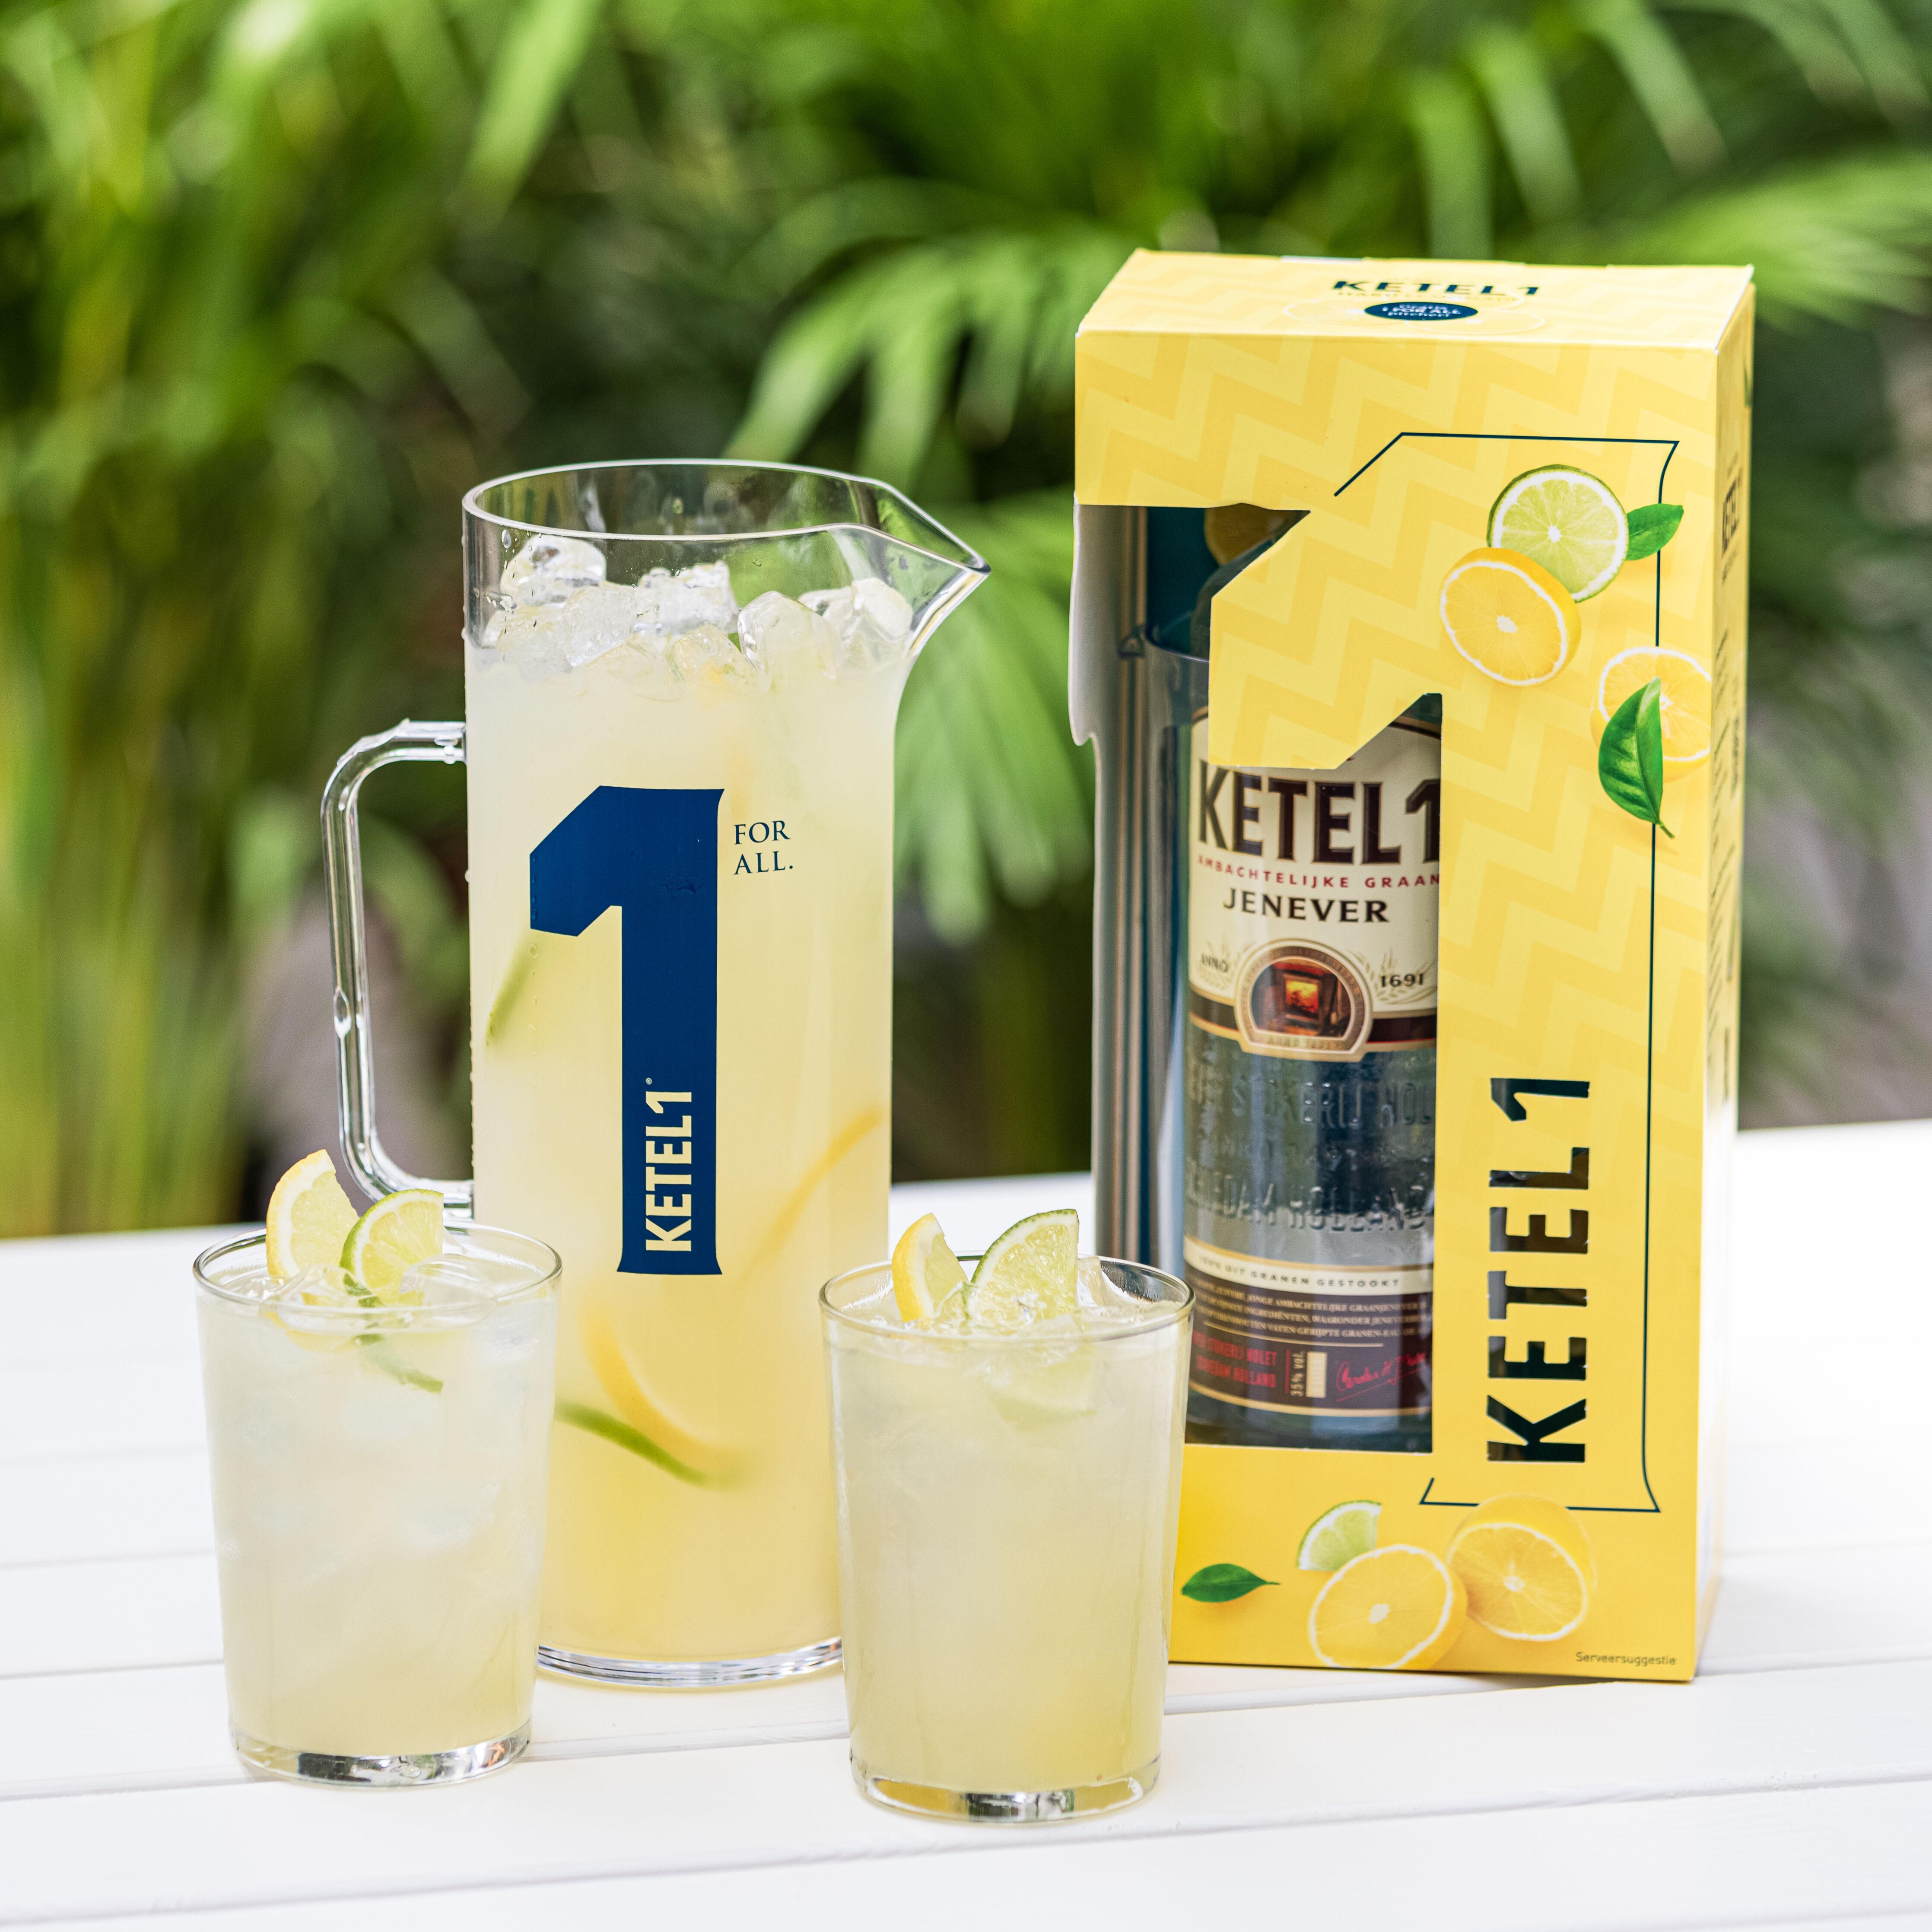 Ketel 1 Hard Lemonade